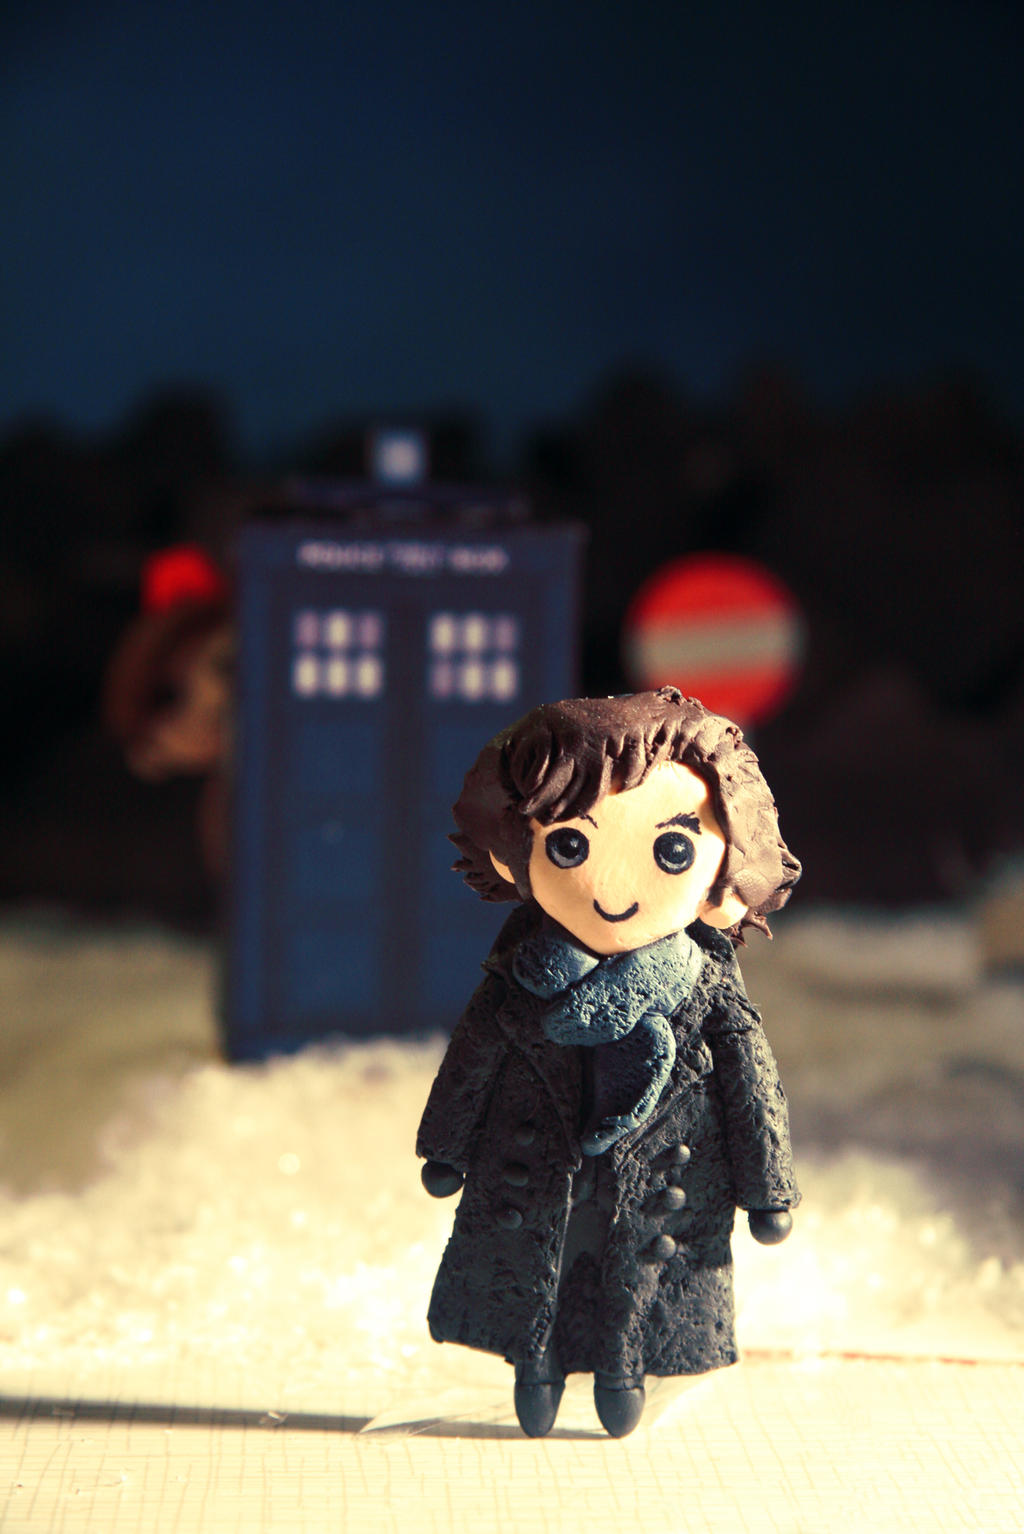 Come along, Sherlock by Monicmon